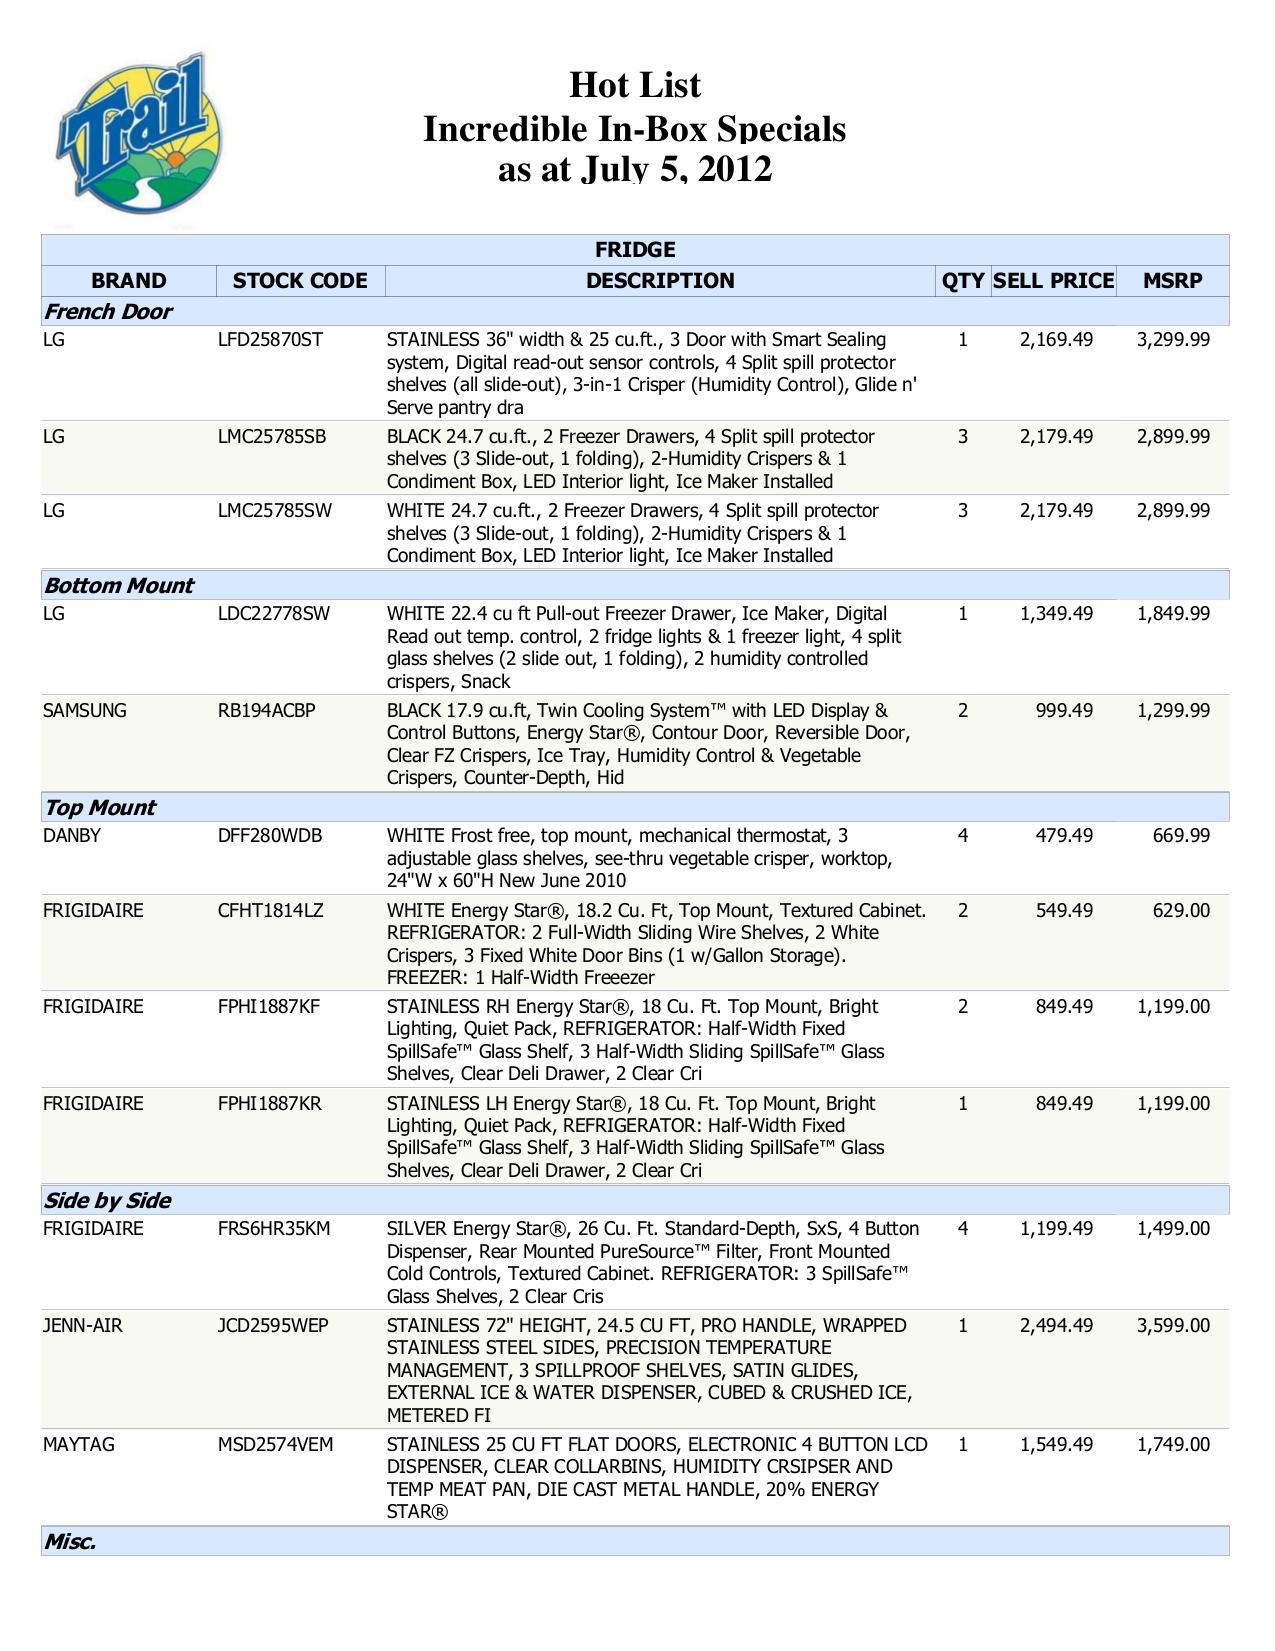 pdf for Wolf Freezer 600 Series BI-36F manual